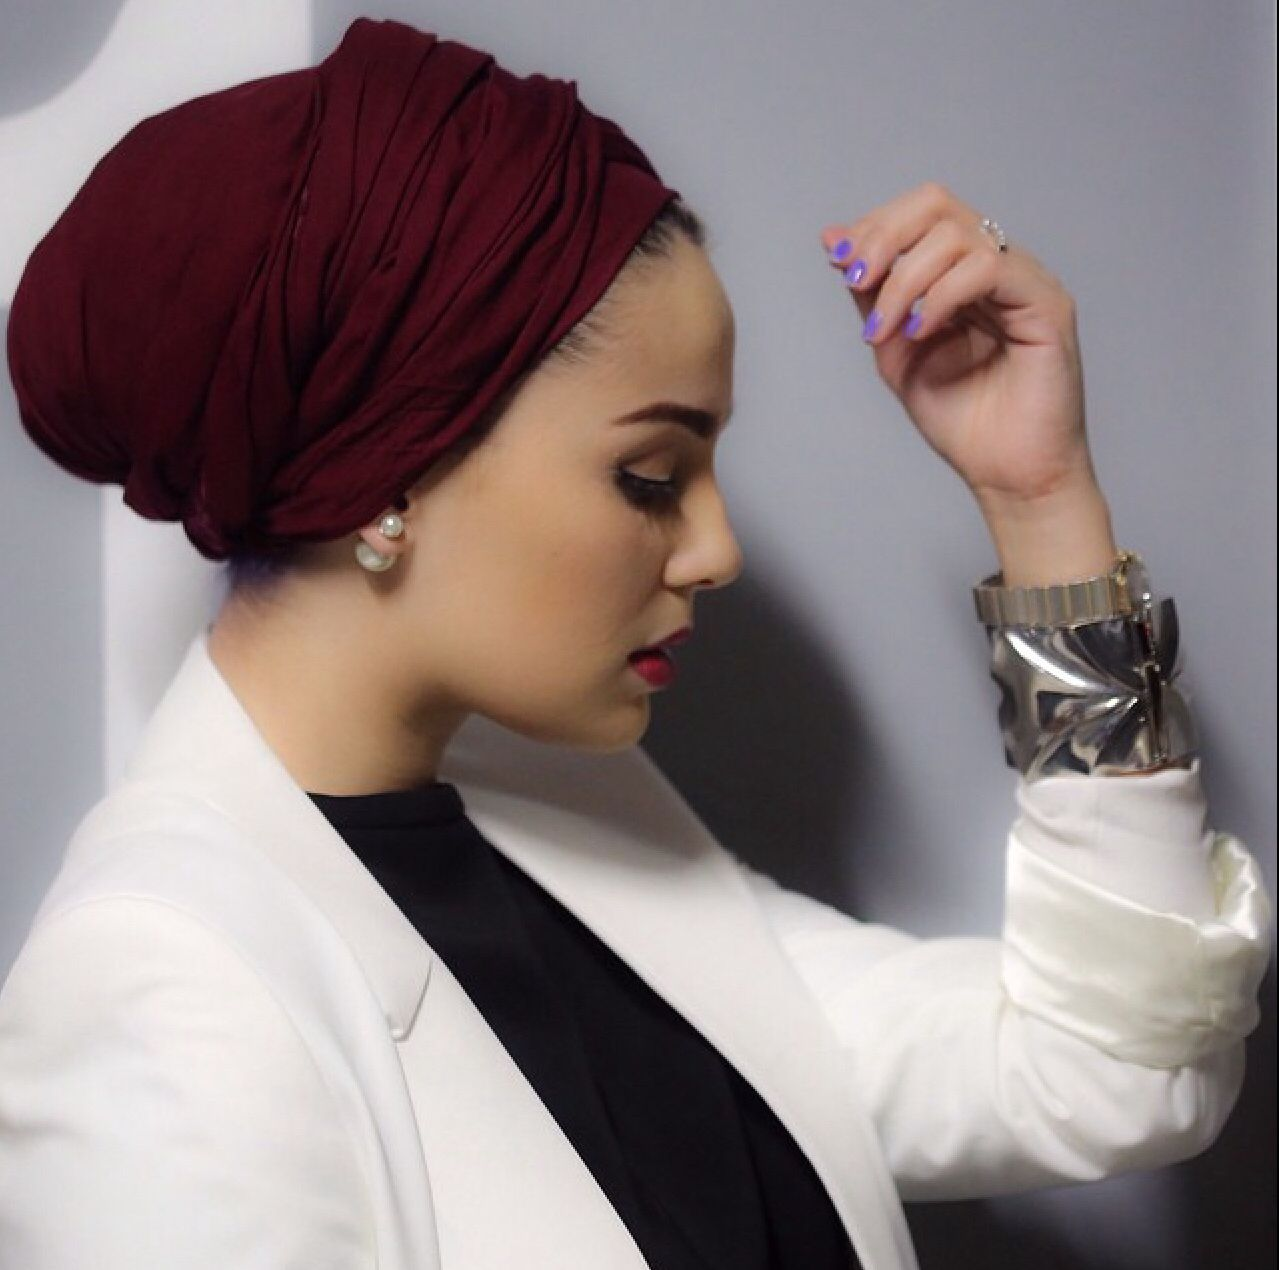 LQQSTORE-Chapeau Voile Musulman Femme Foulard Femme Musulman